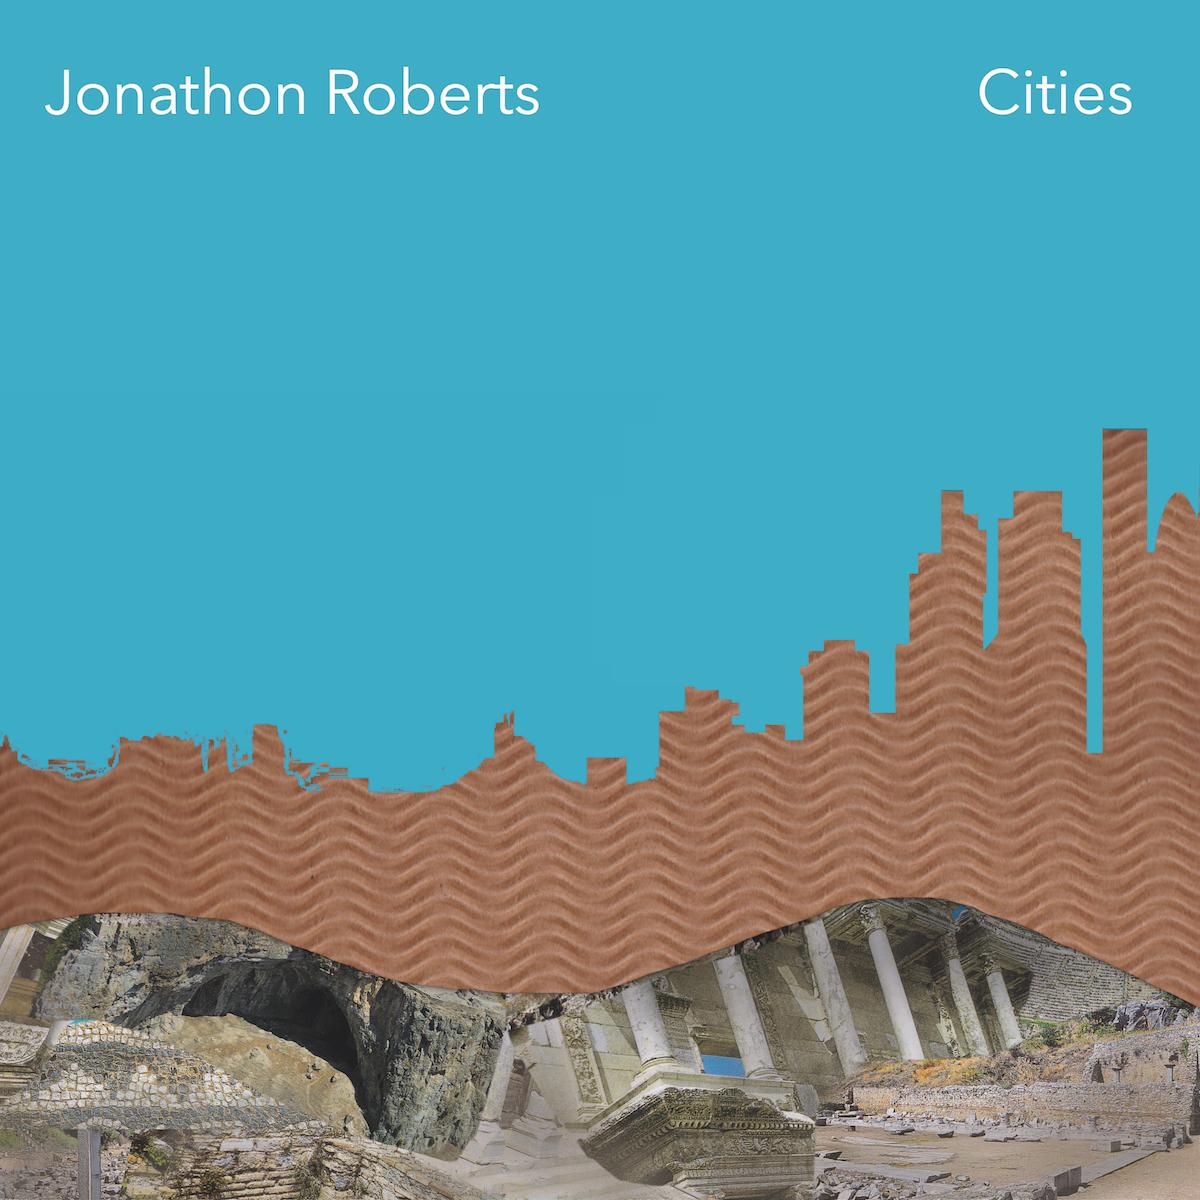 cities.JPG